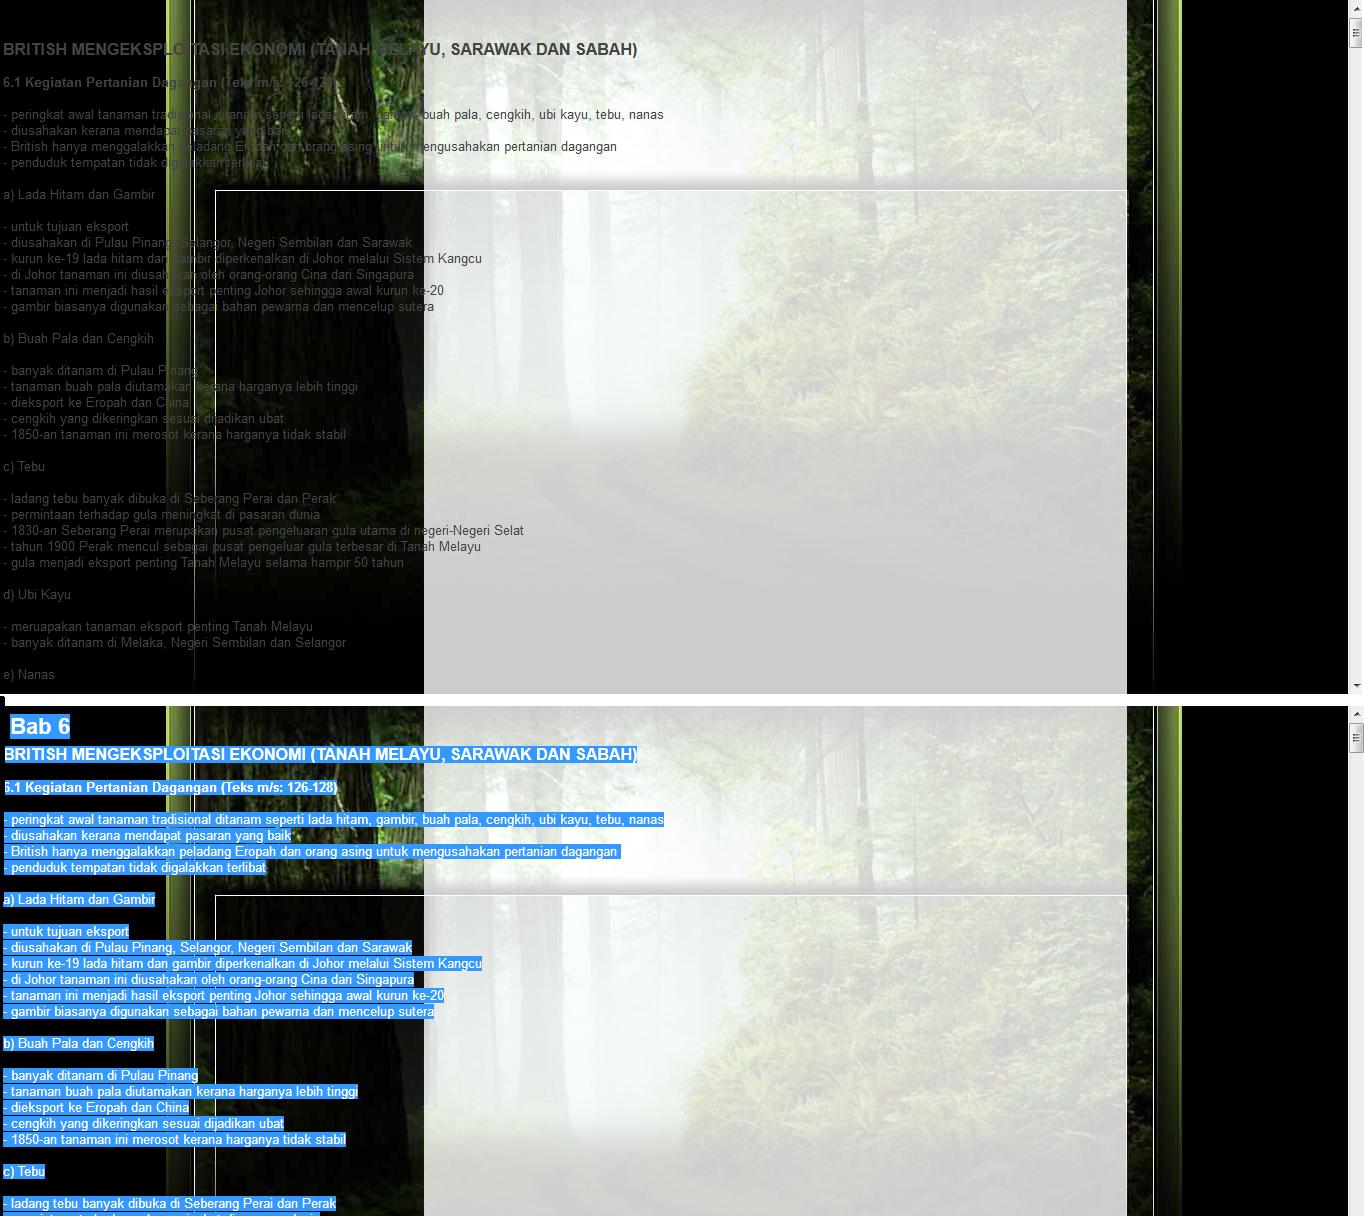 Unduh 9500 Koleksi Background Hitam Tanaman Gratis Terbaru